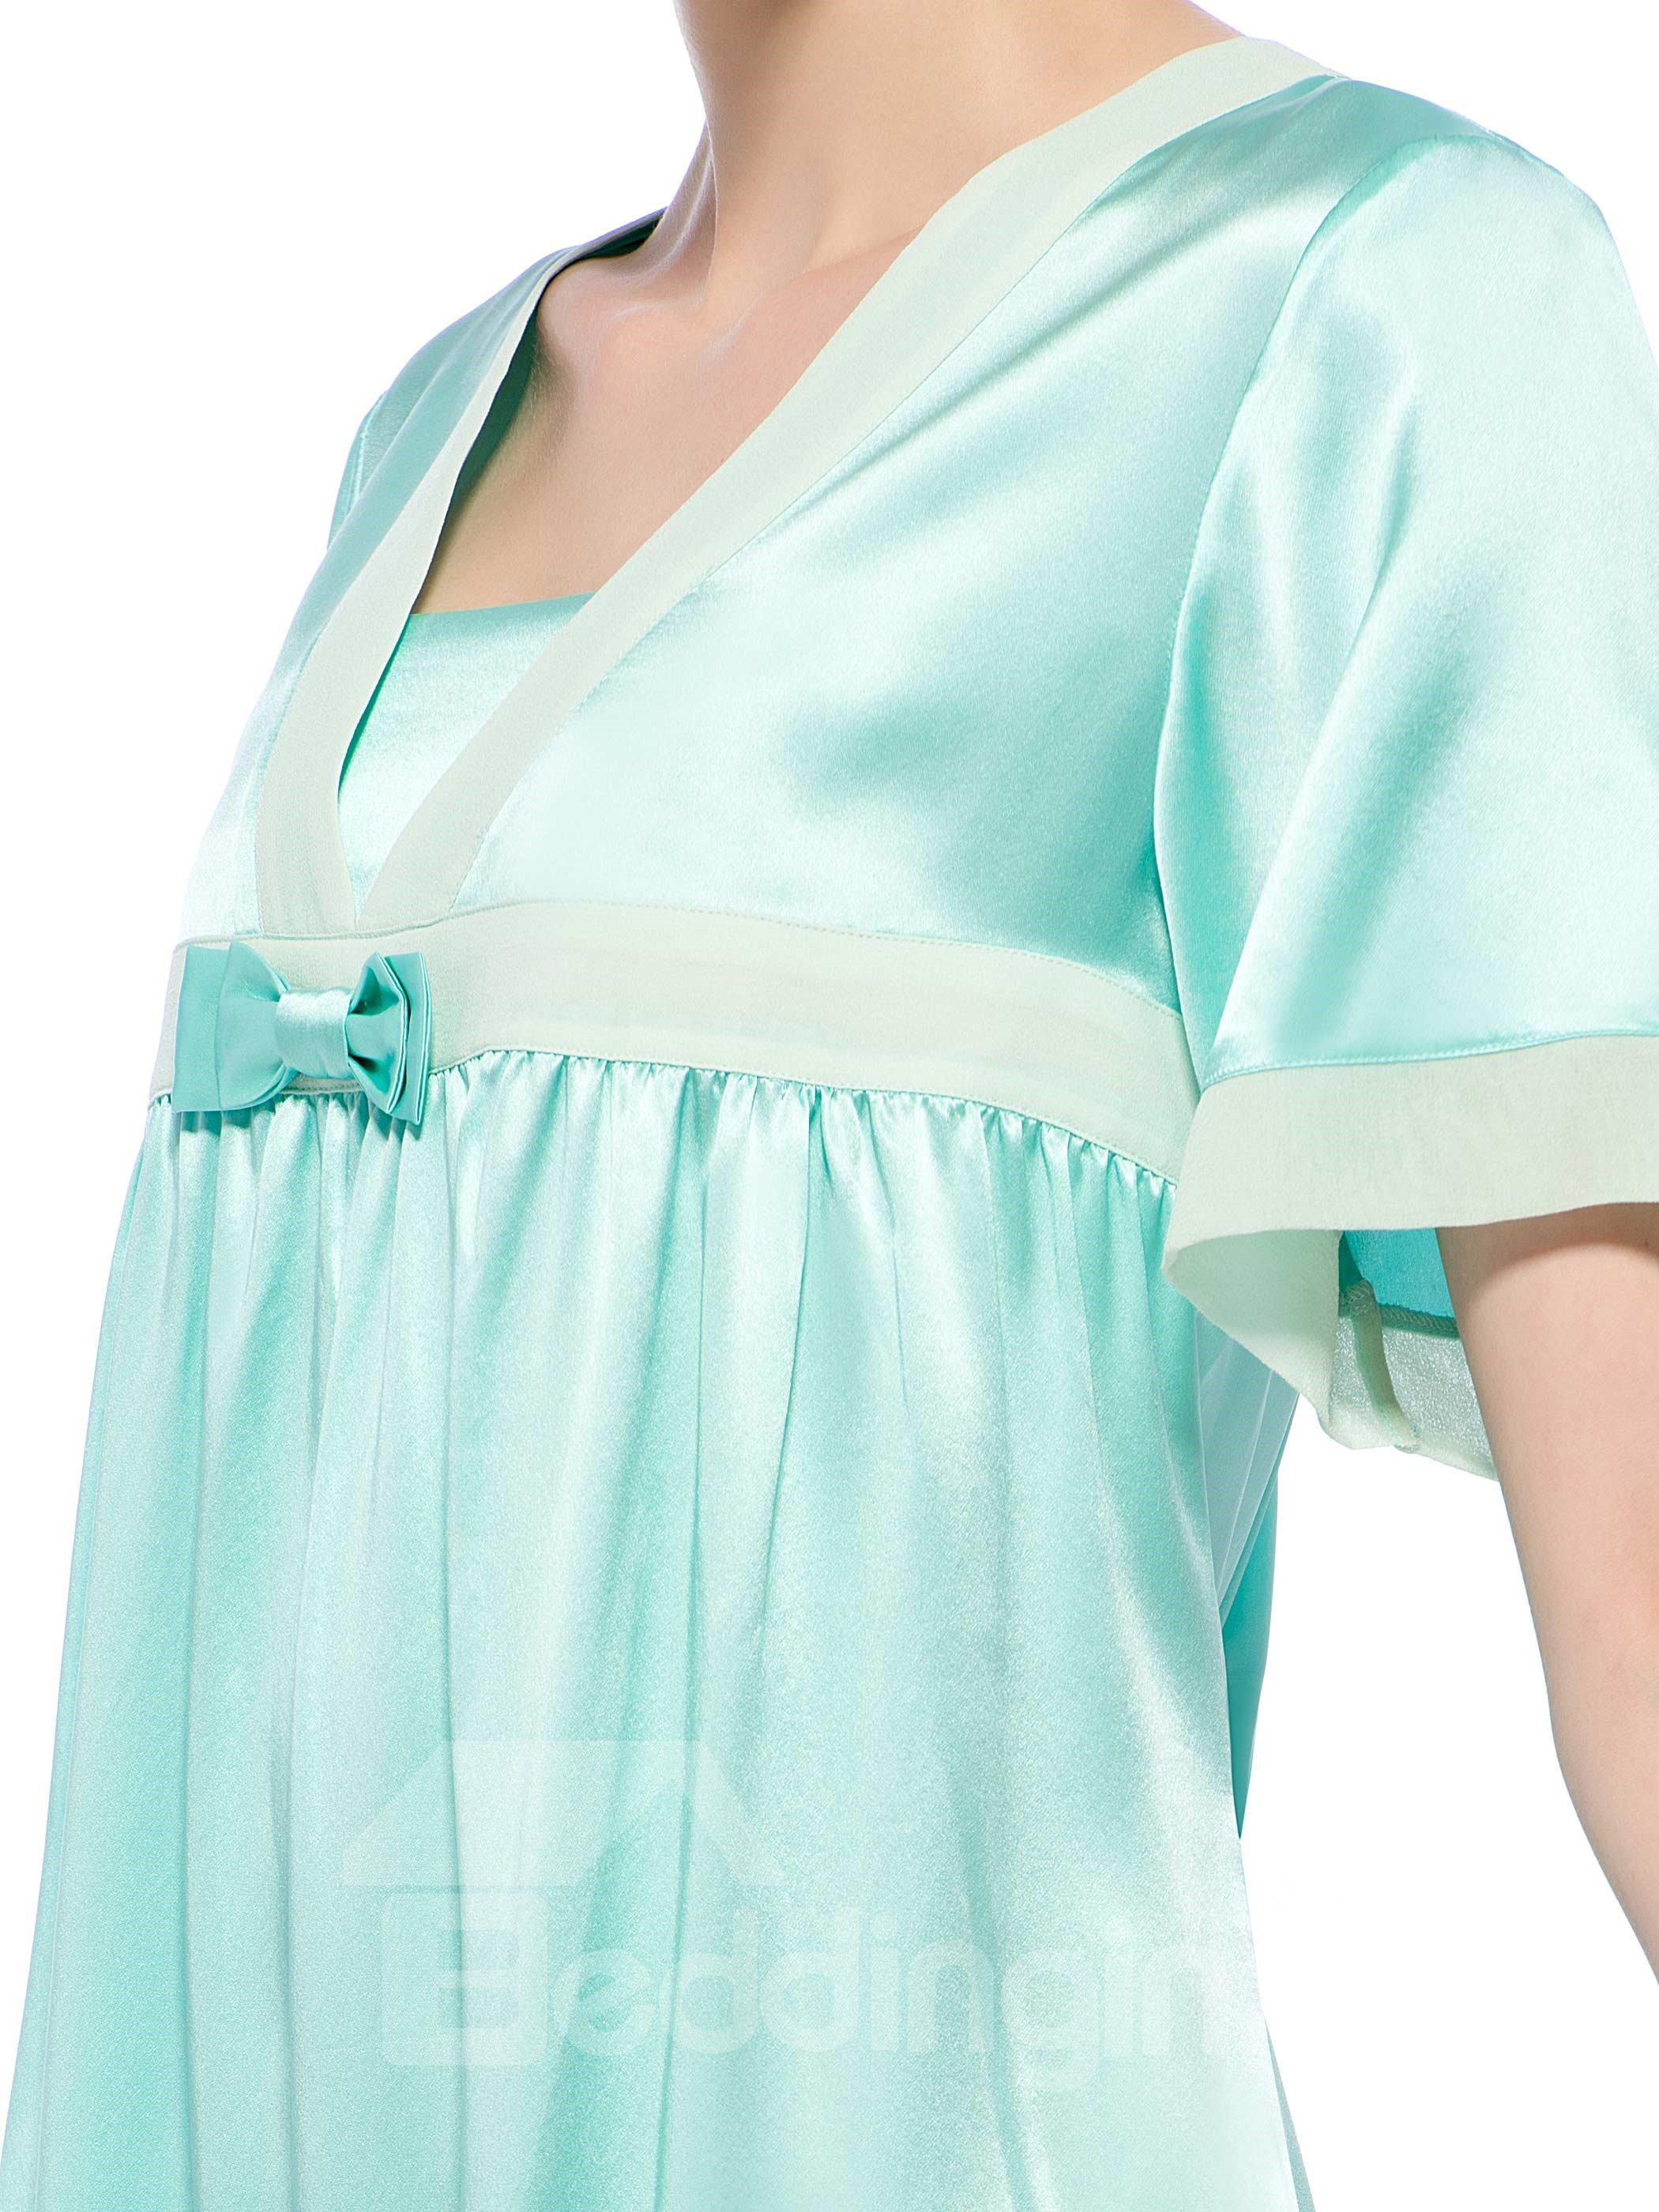 Cinderella Light Green Bowknot Trim Bust Short Sleeves Silk Nightgown